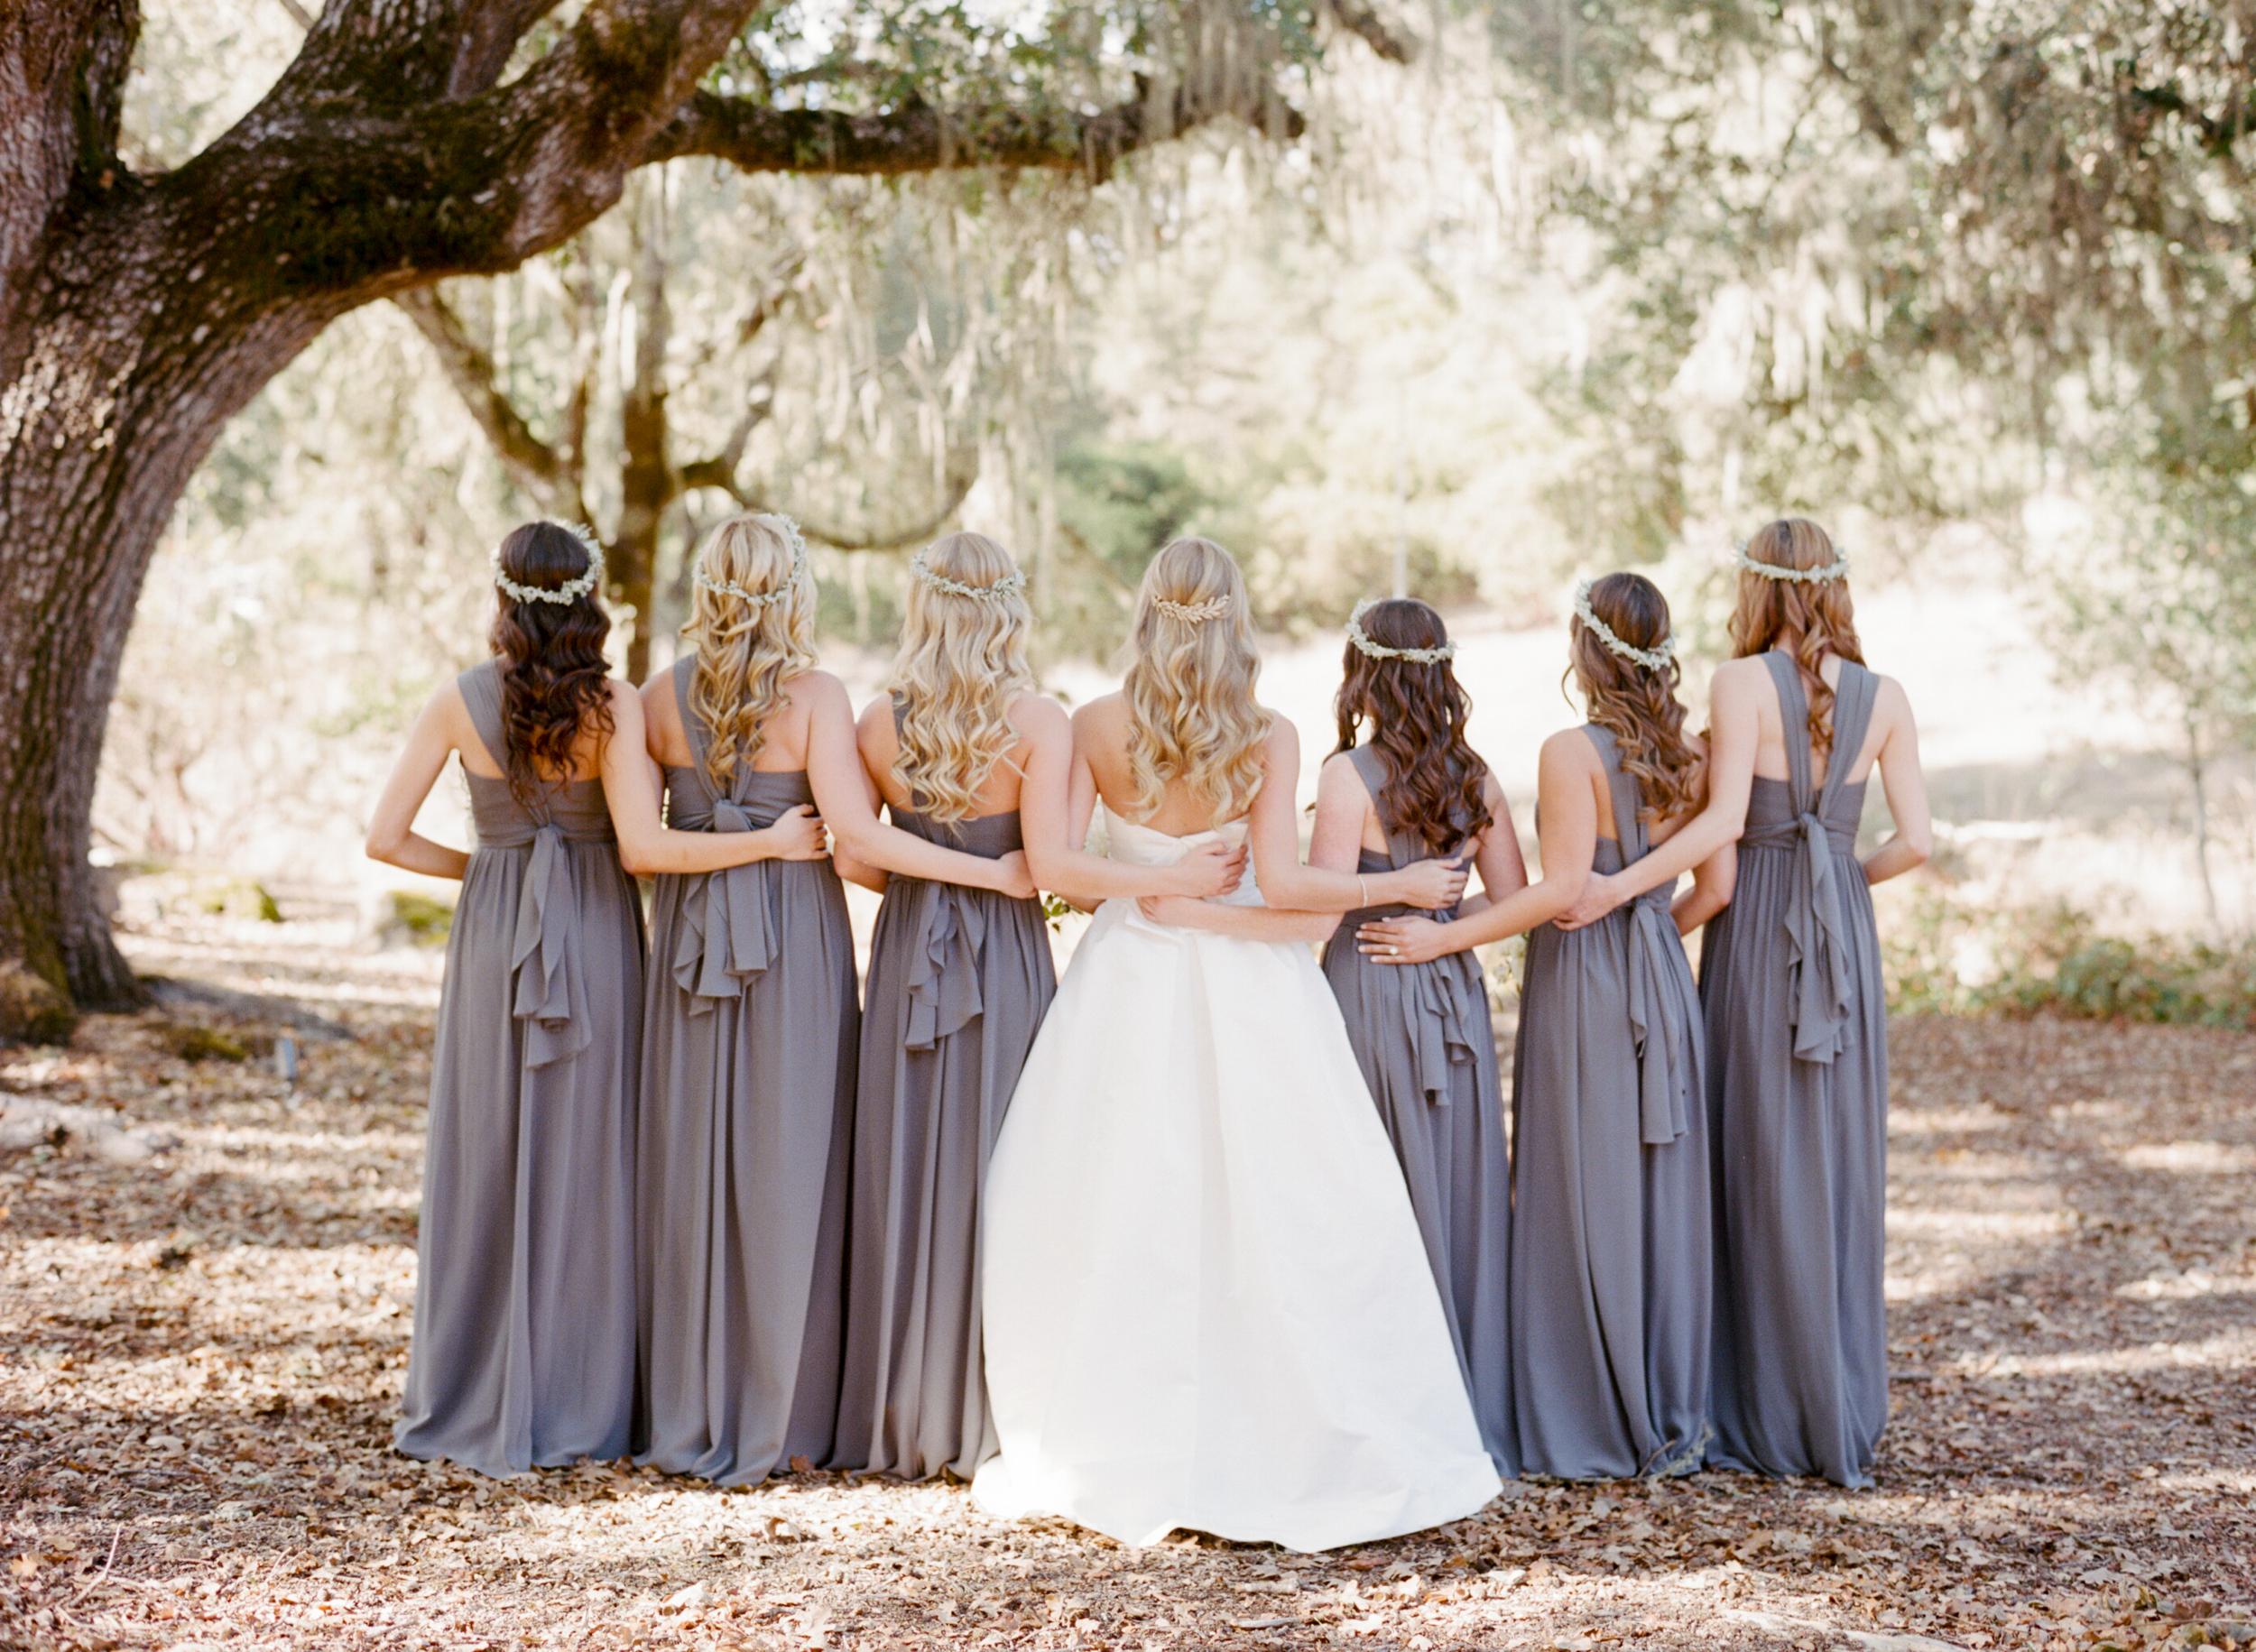 SylvieGil-Durham-Ranch-Organic-Ethereal-Rustic-Bridesmaids-Wedding